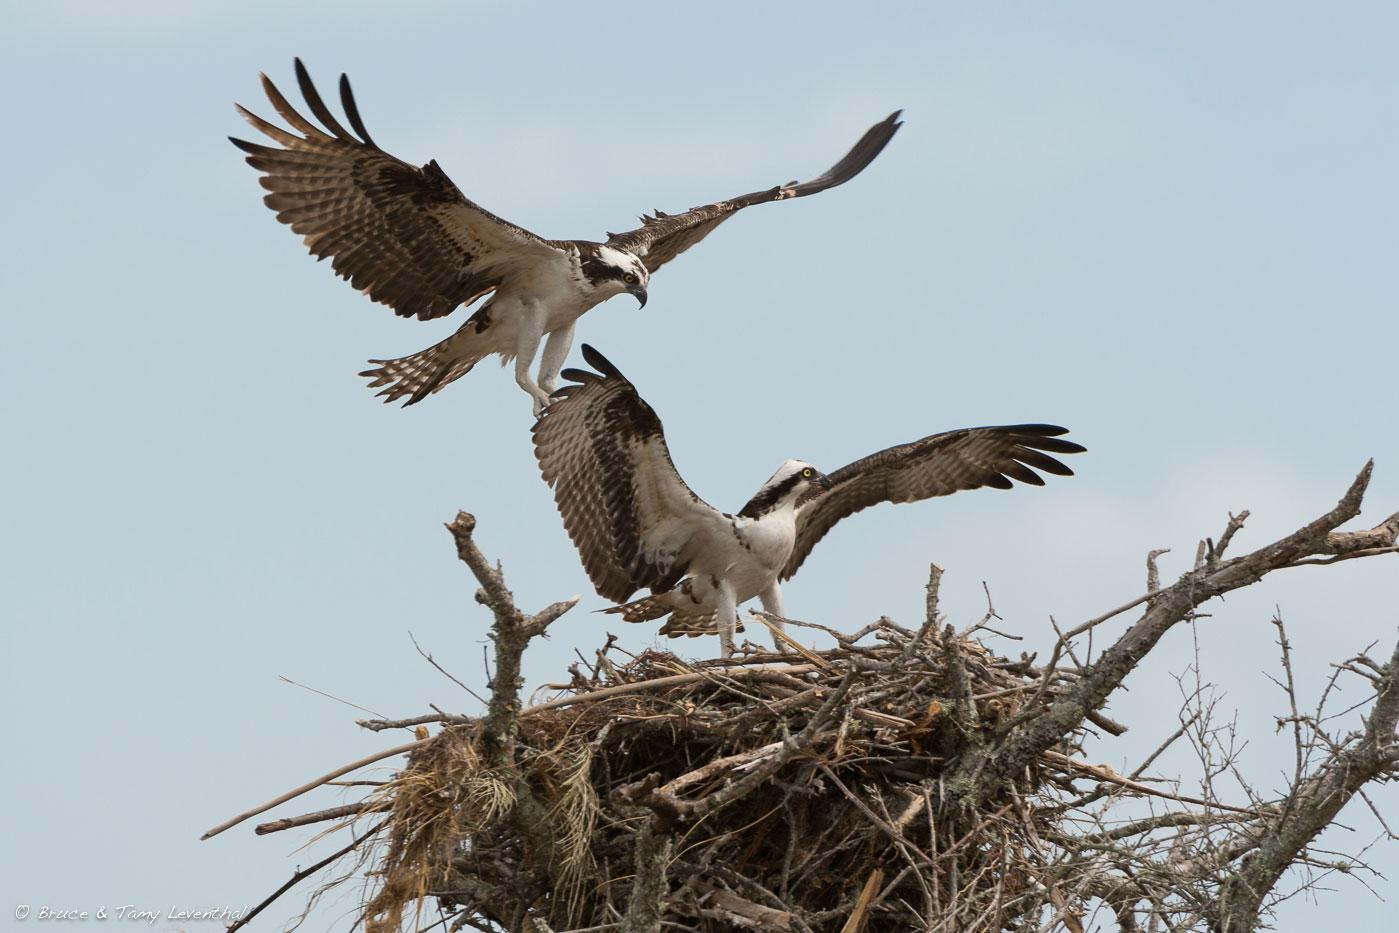 Osprey Nest Building ( Pandion haliaetus )  Nikon D4 + Nikon 200-400mm f4VR... here AF speed and 10 frames per second help catch the peak moment